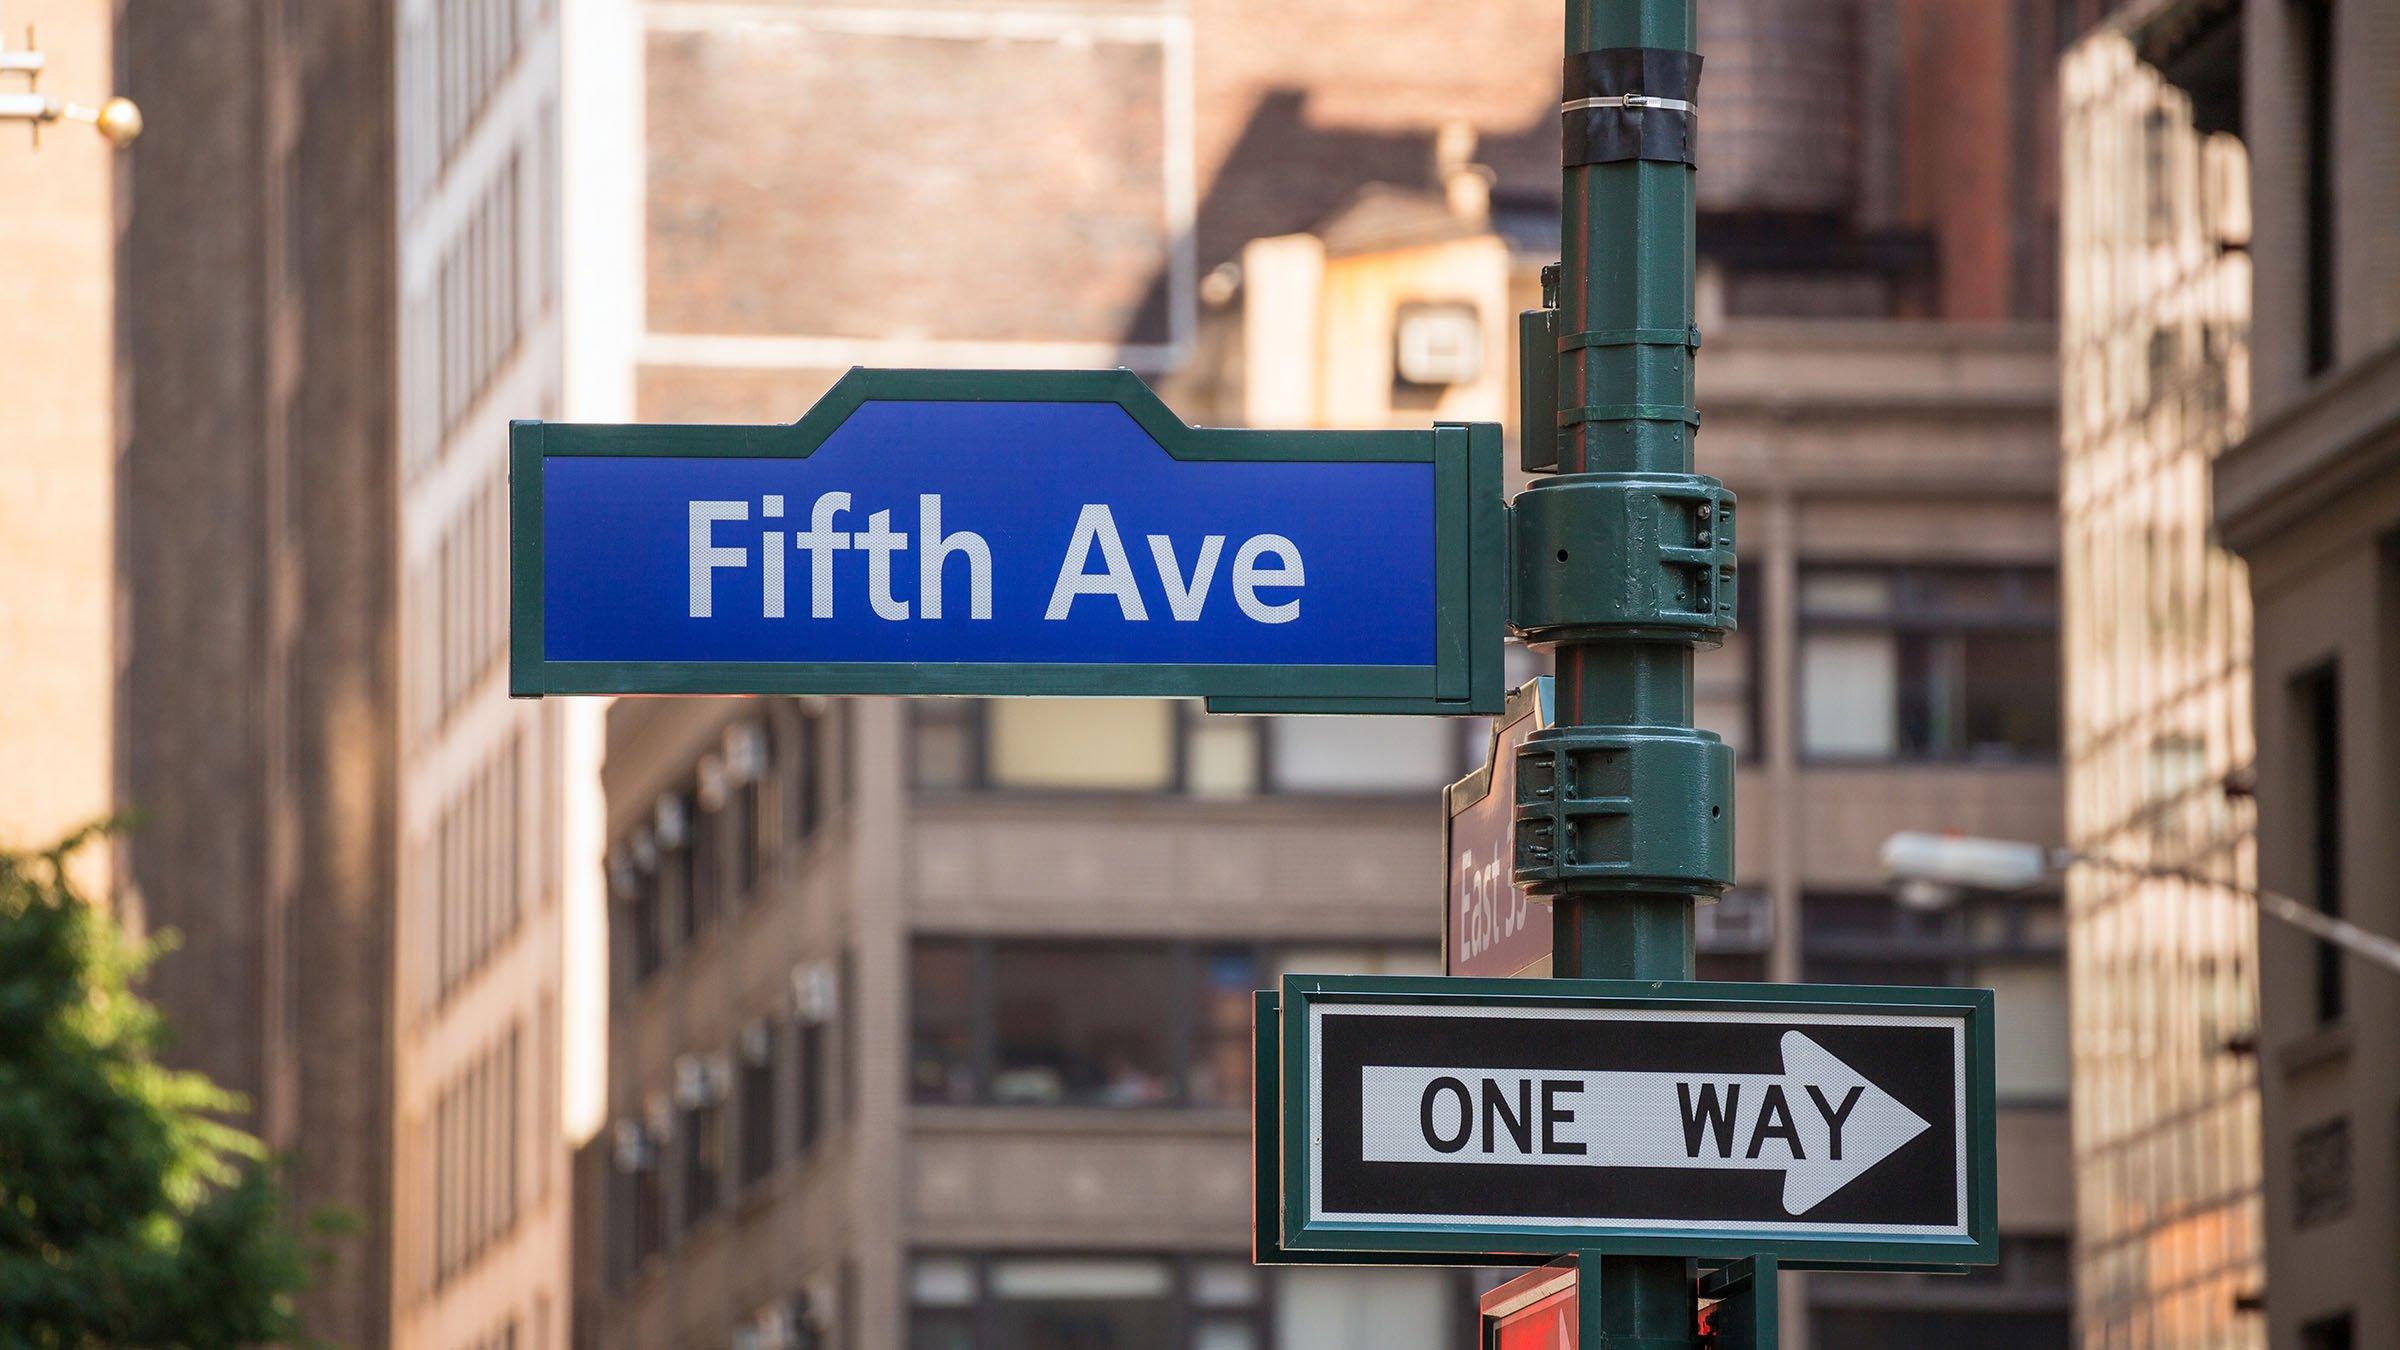 Resultado de imagen para avenida 15 de new york